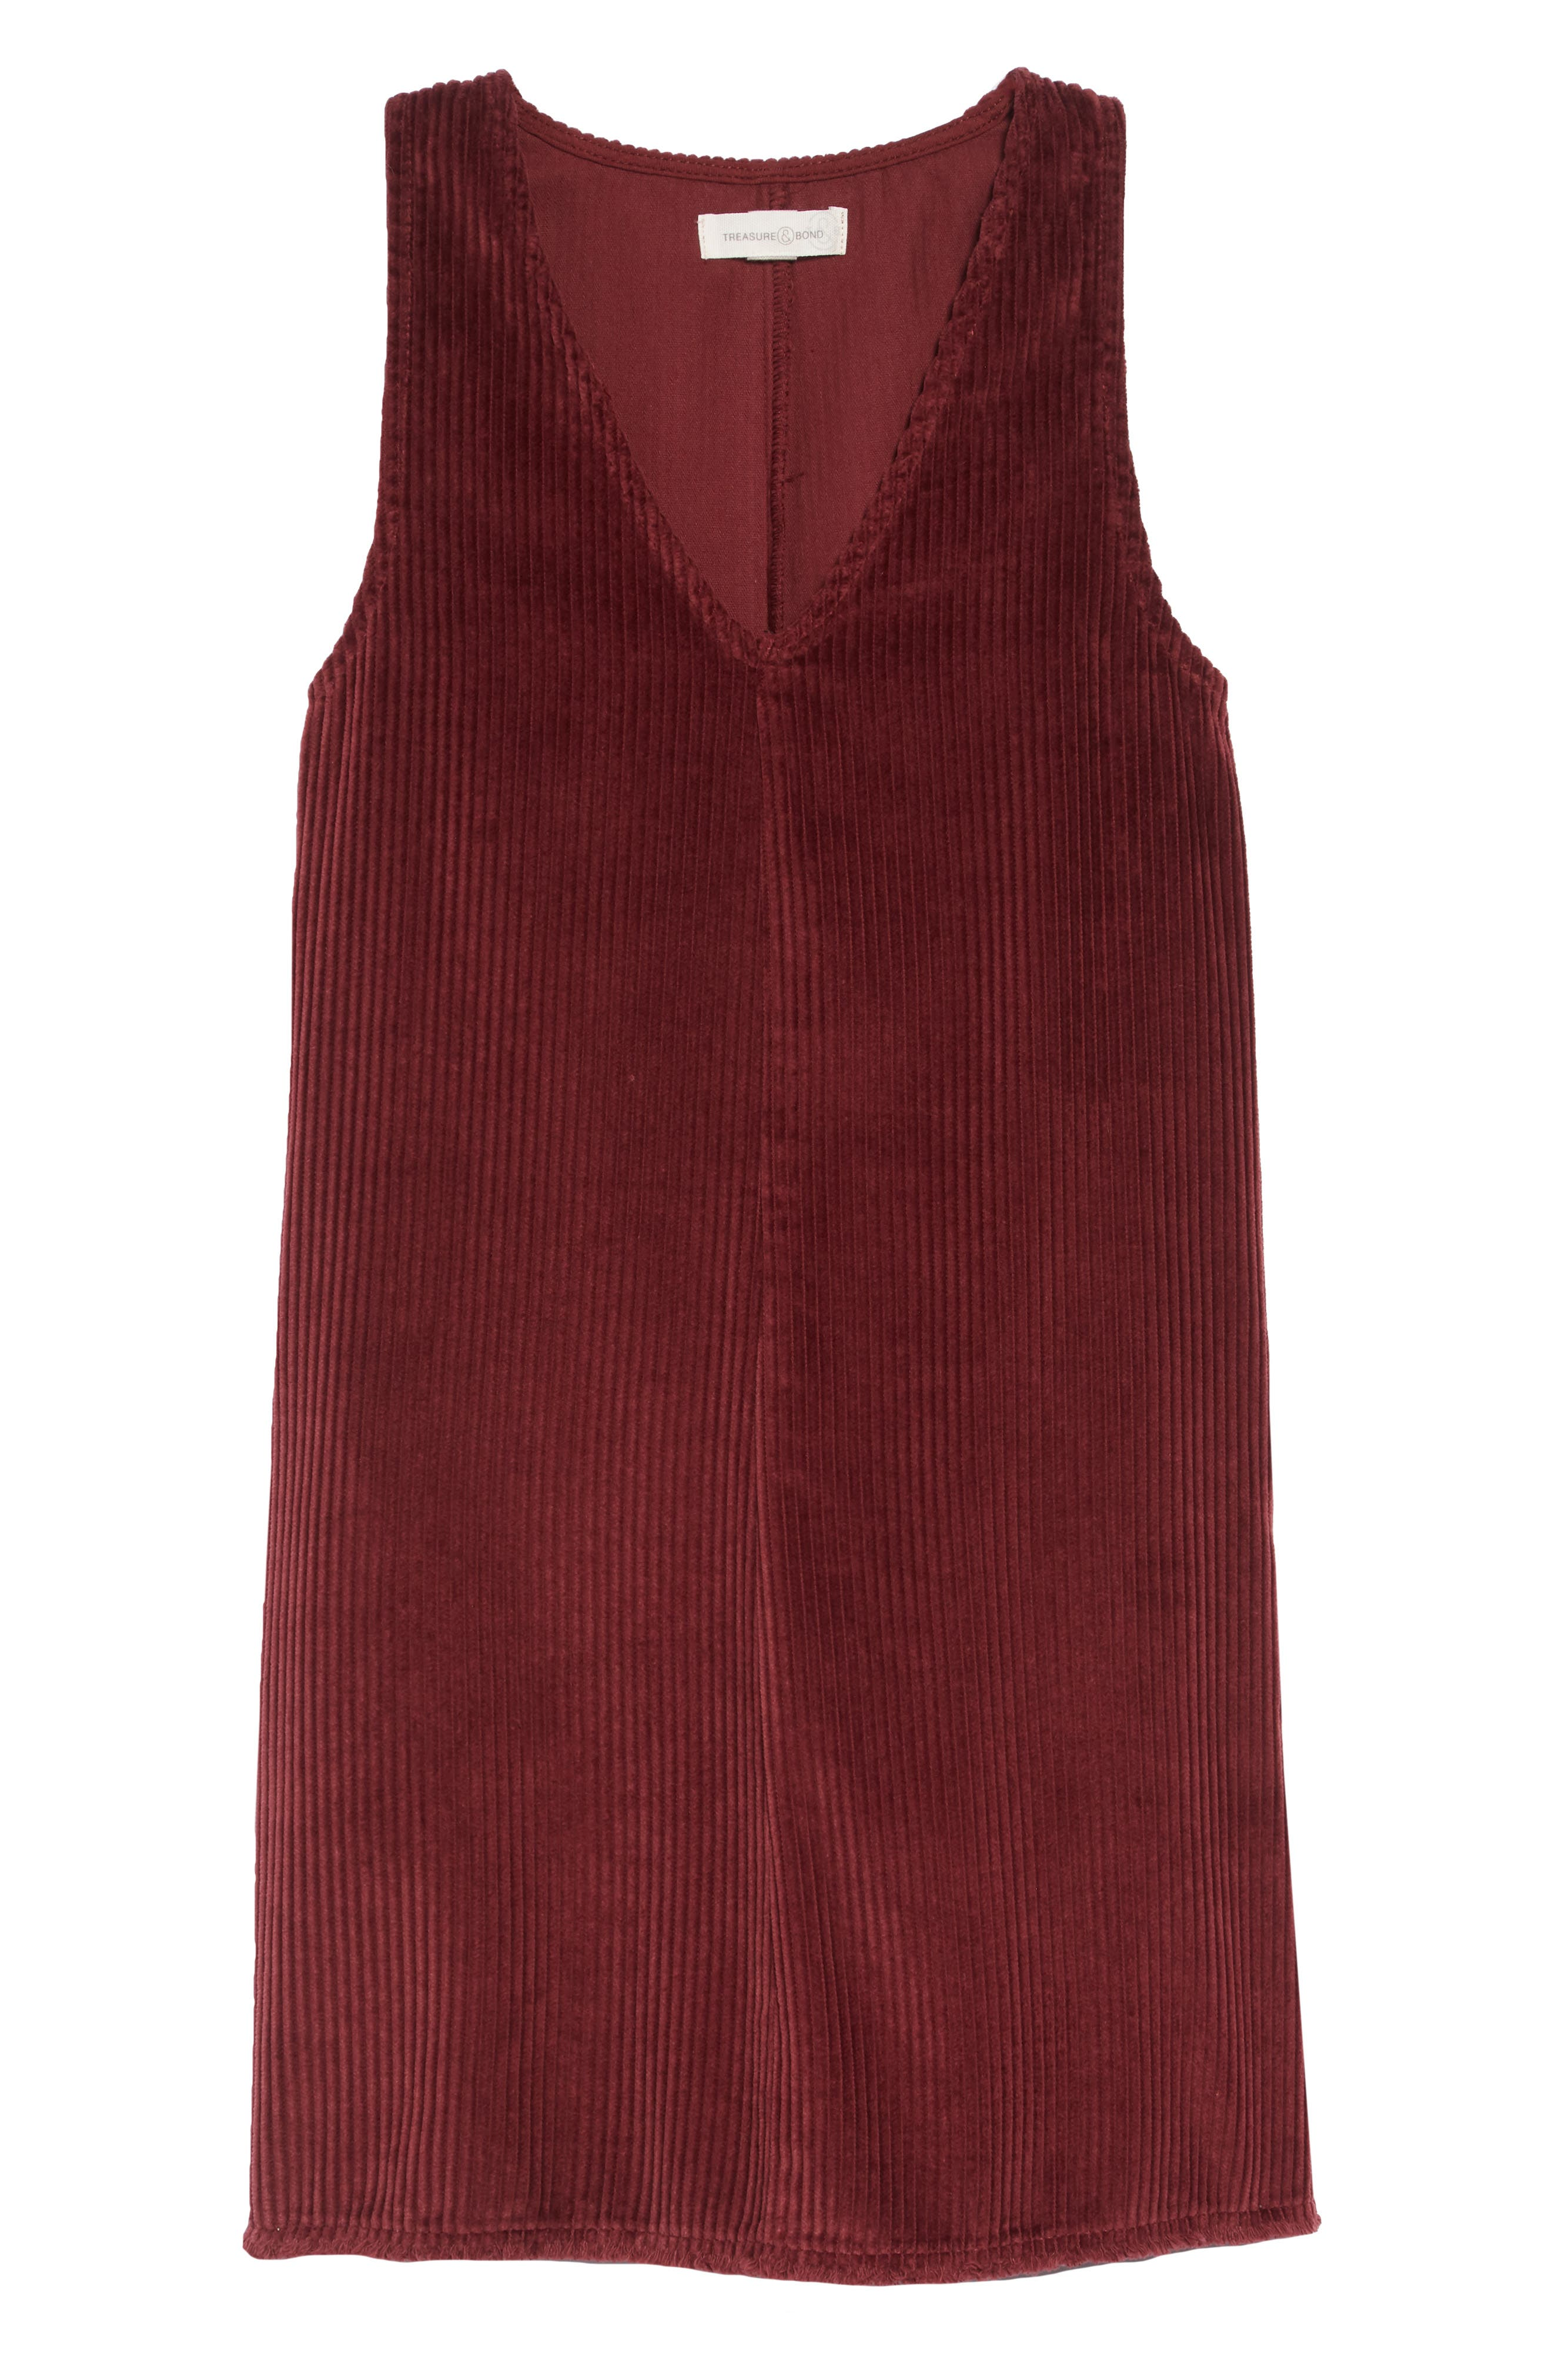 TREASURE & BOND Corduroy Jumper Dress, Main, color, 601